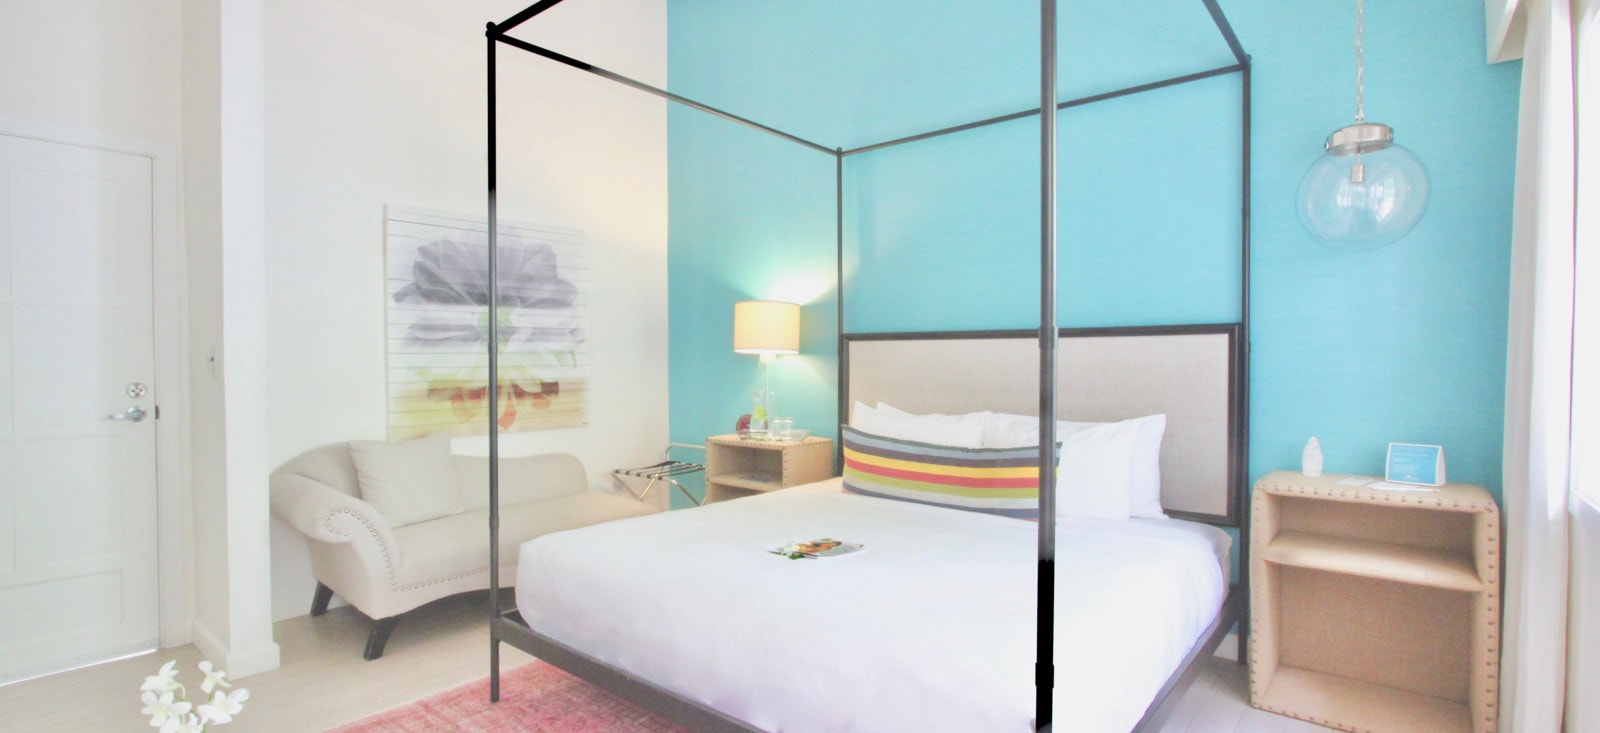 deluxe-room-guapinol-2_2_orig.jpg